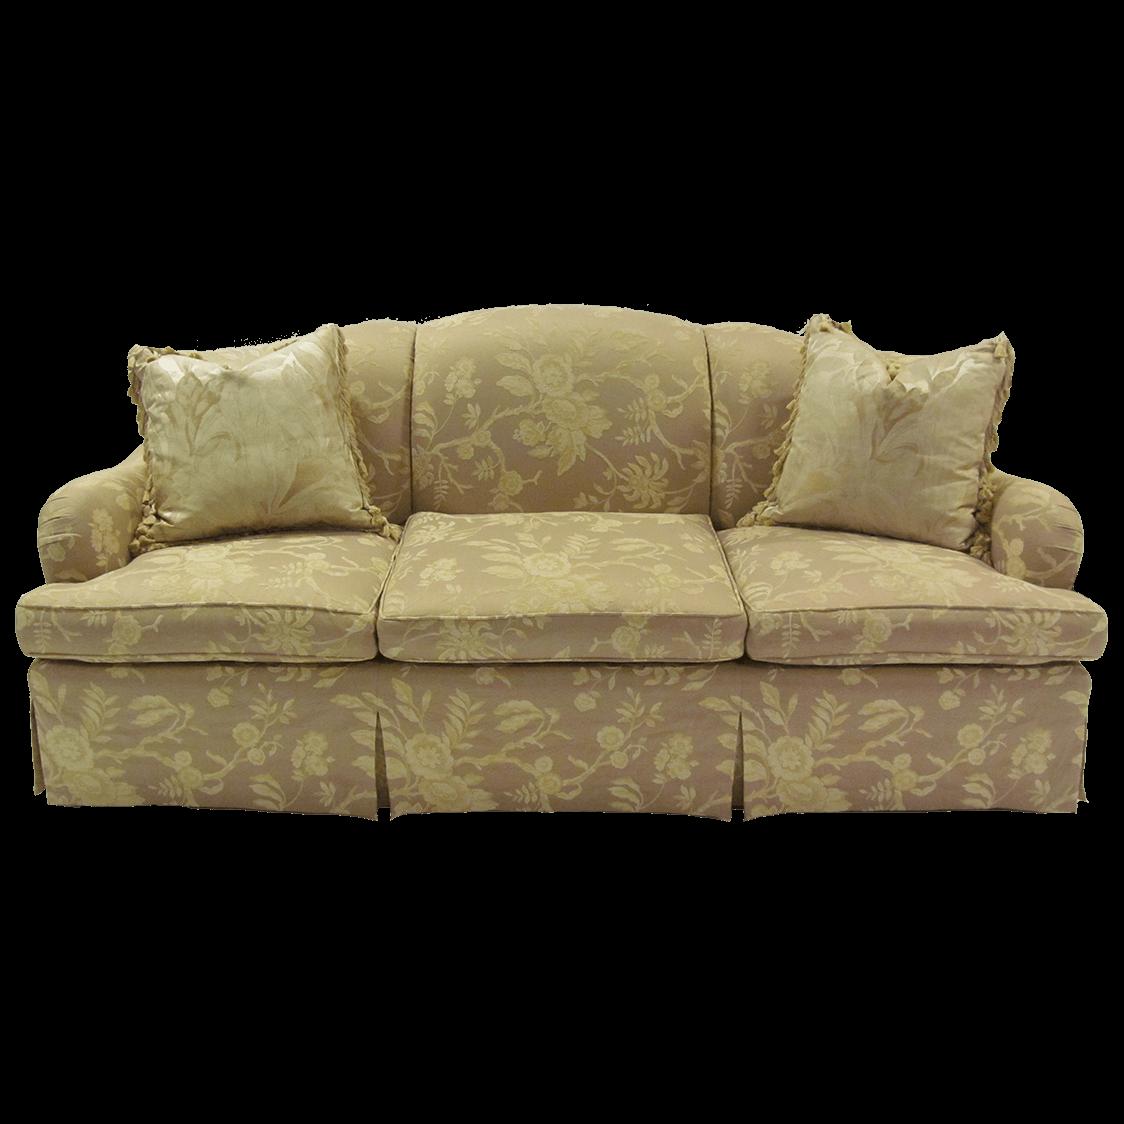 floral sectional sofa nova black and red bonded leather corner left hand 87 quot skirted kdrshowrooms